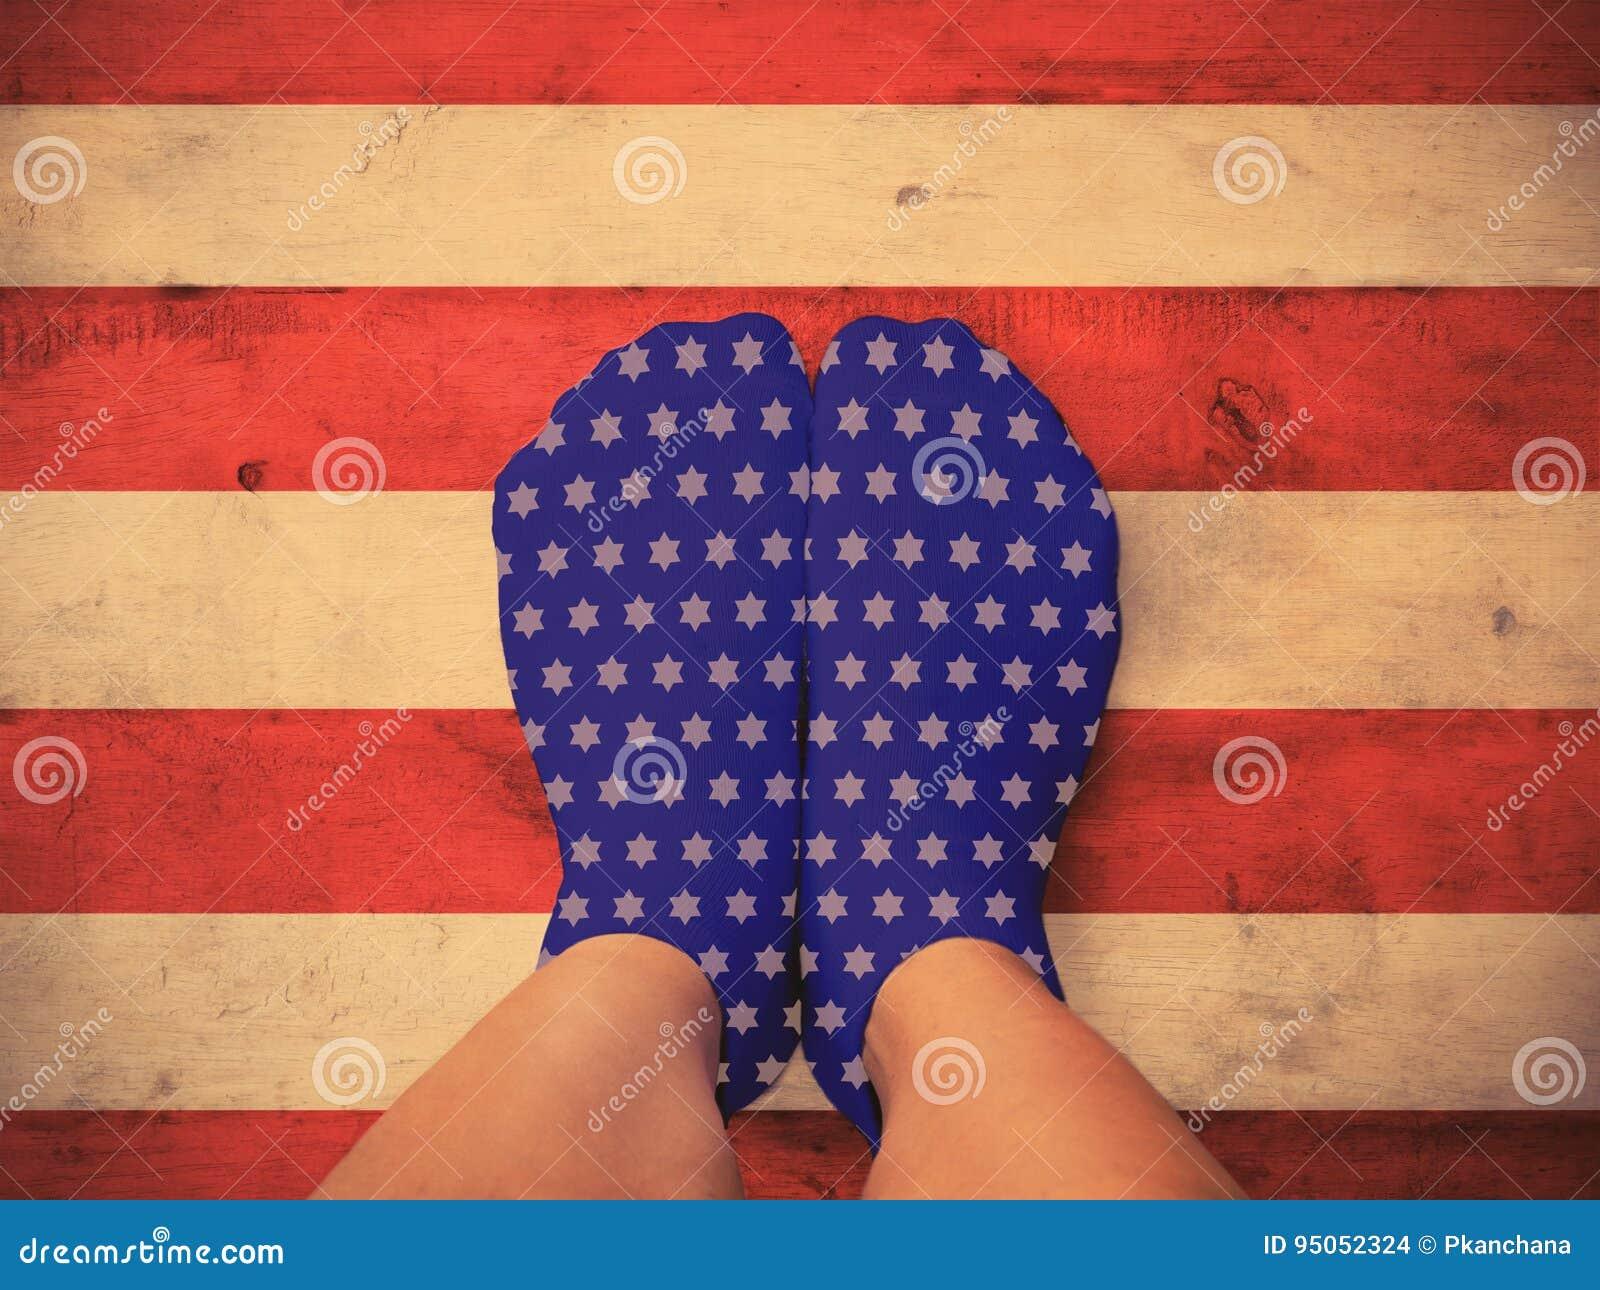 Feet wearing blue socks with white star shape on wooden floor